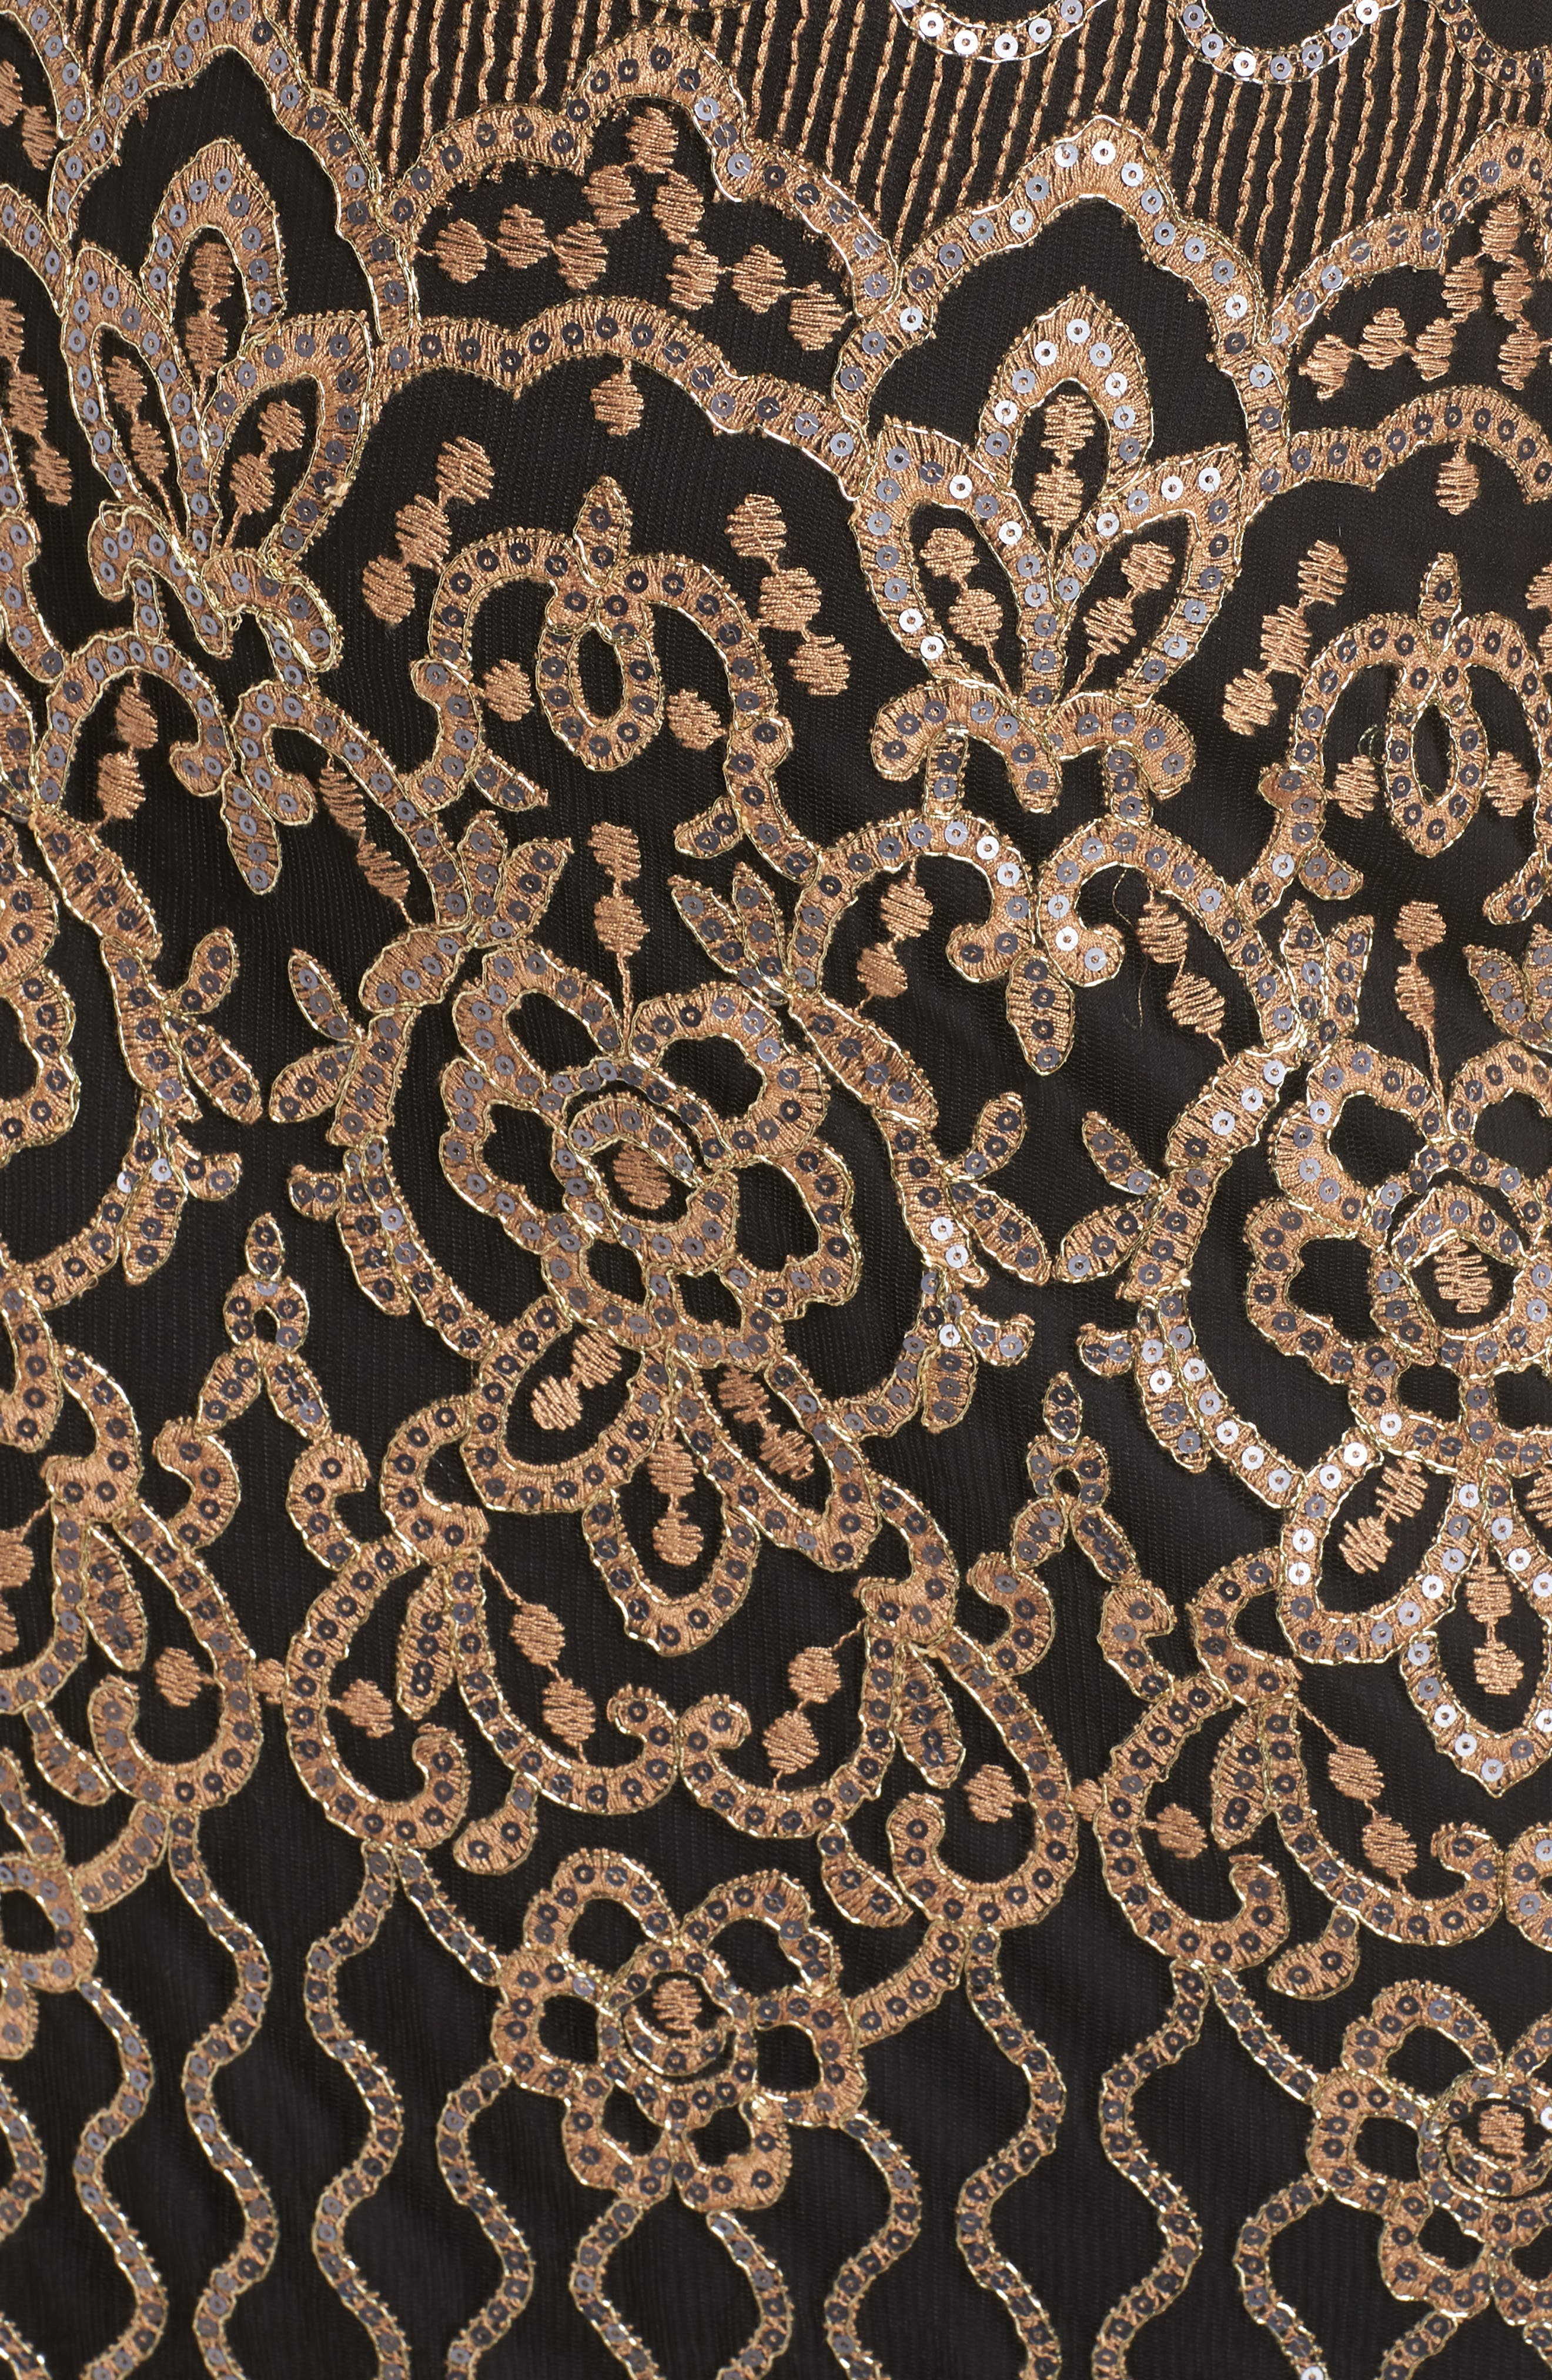 Sequin Embellished Dress,                             Alternate thumbnail 12, color,                             COPPER SHADOW/ BLACK